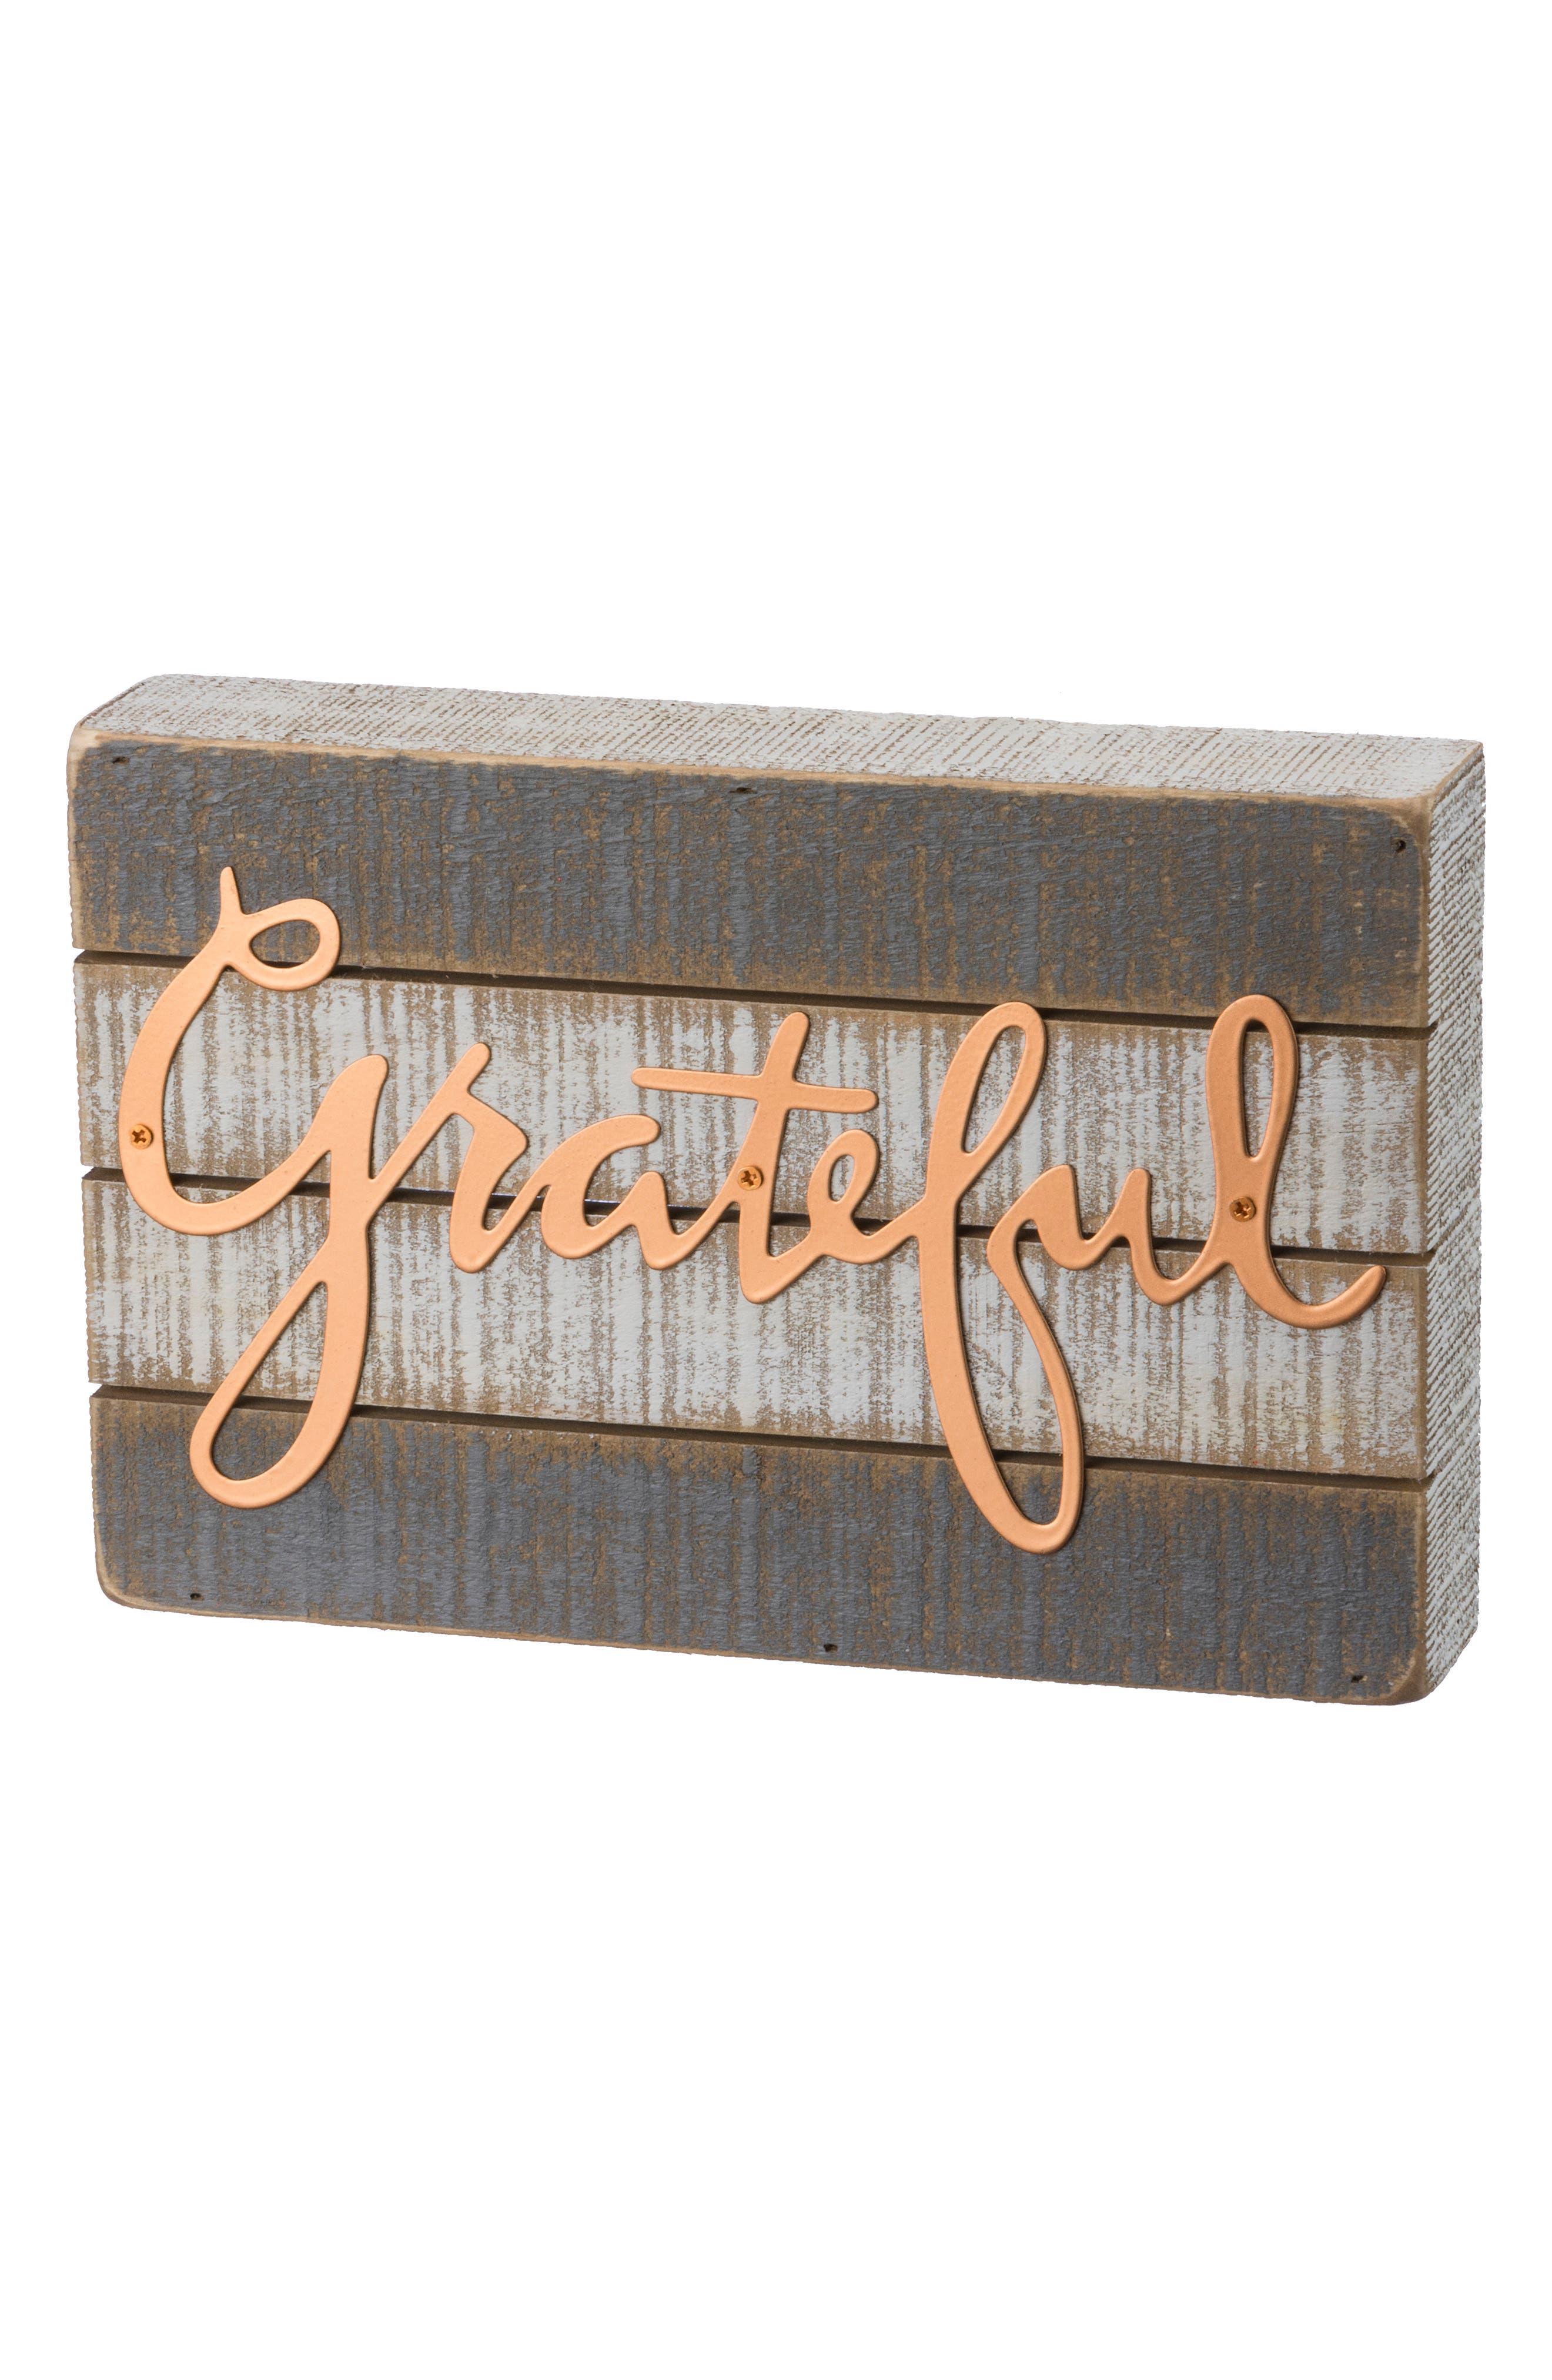 Grateful Wood Box Sign,                         Main,                         color, Grey